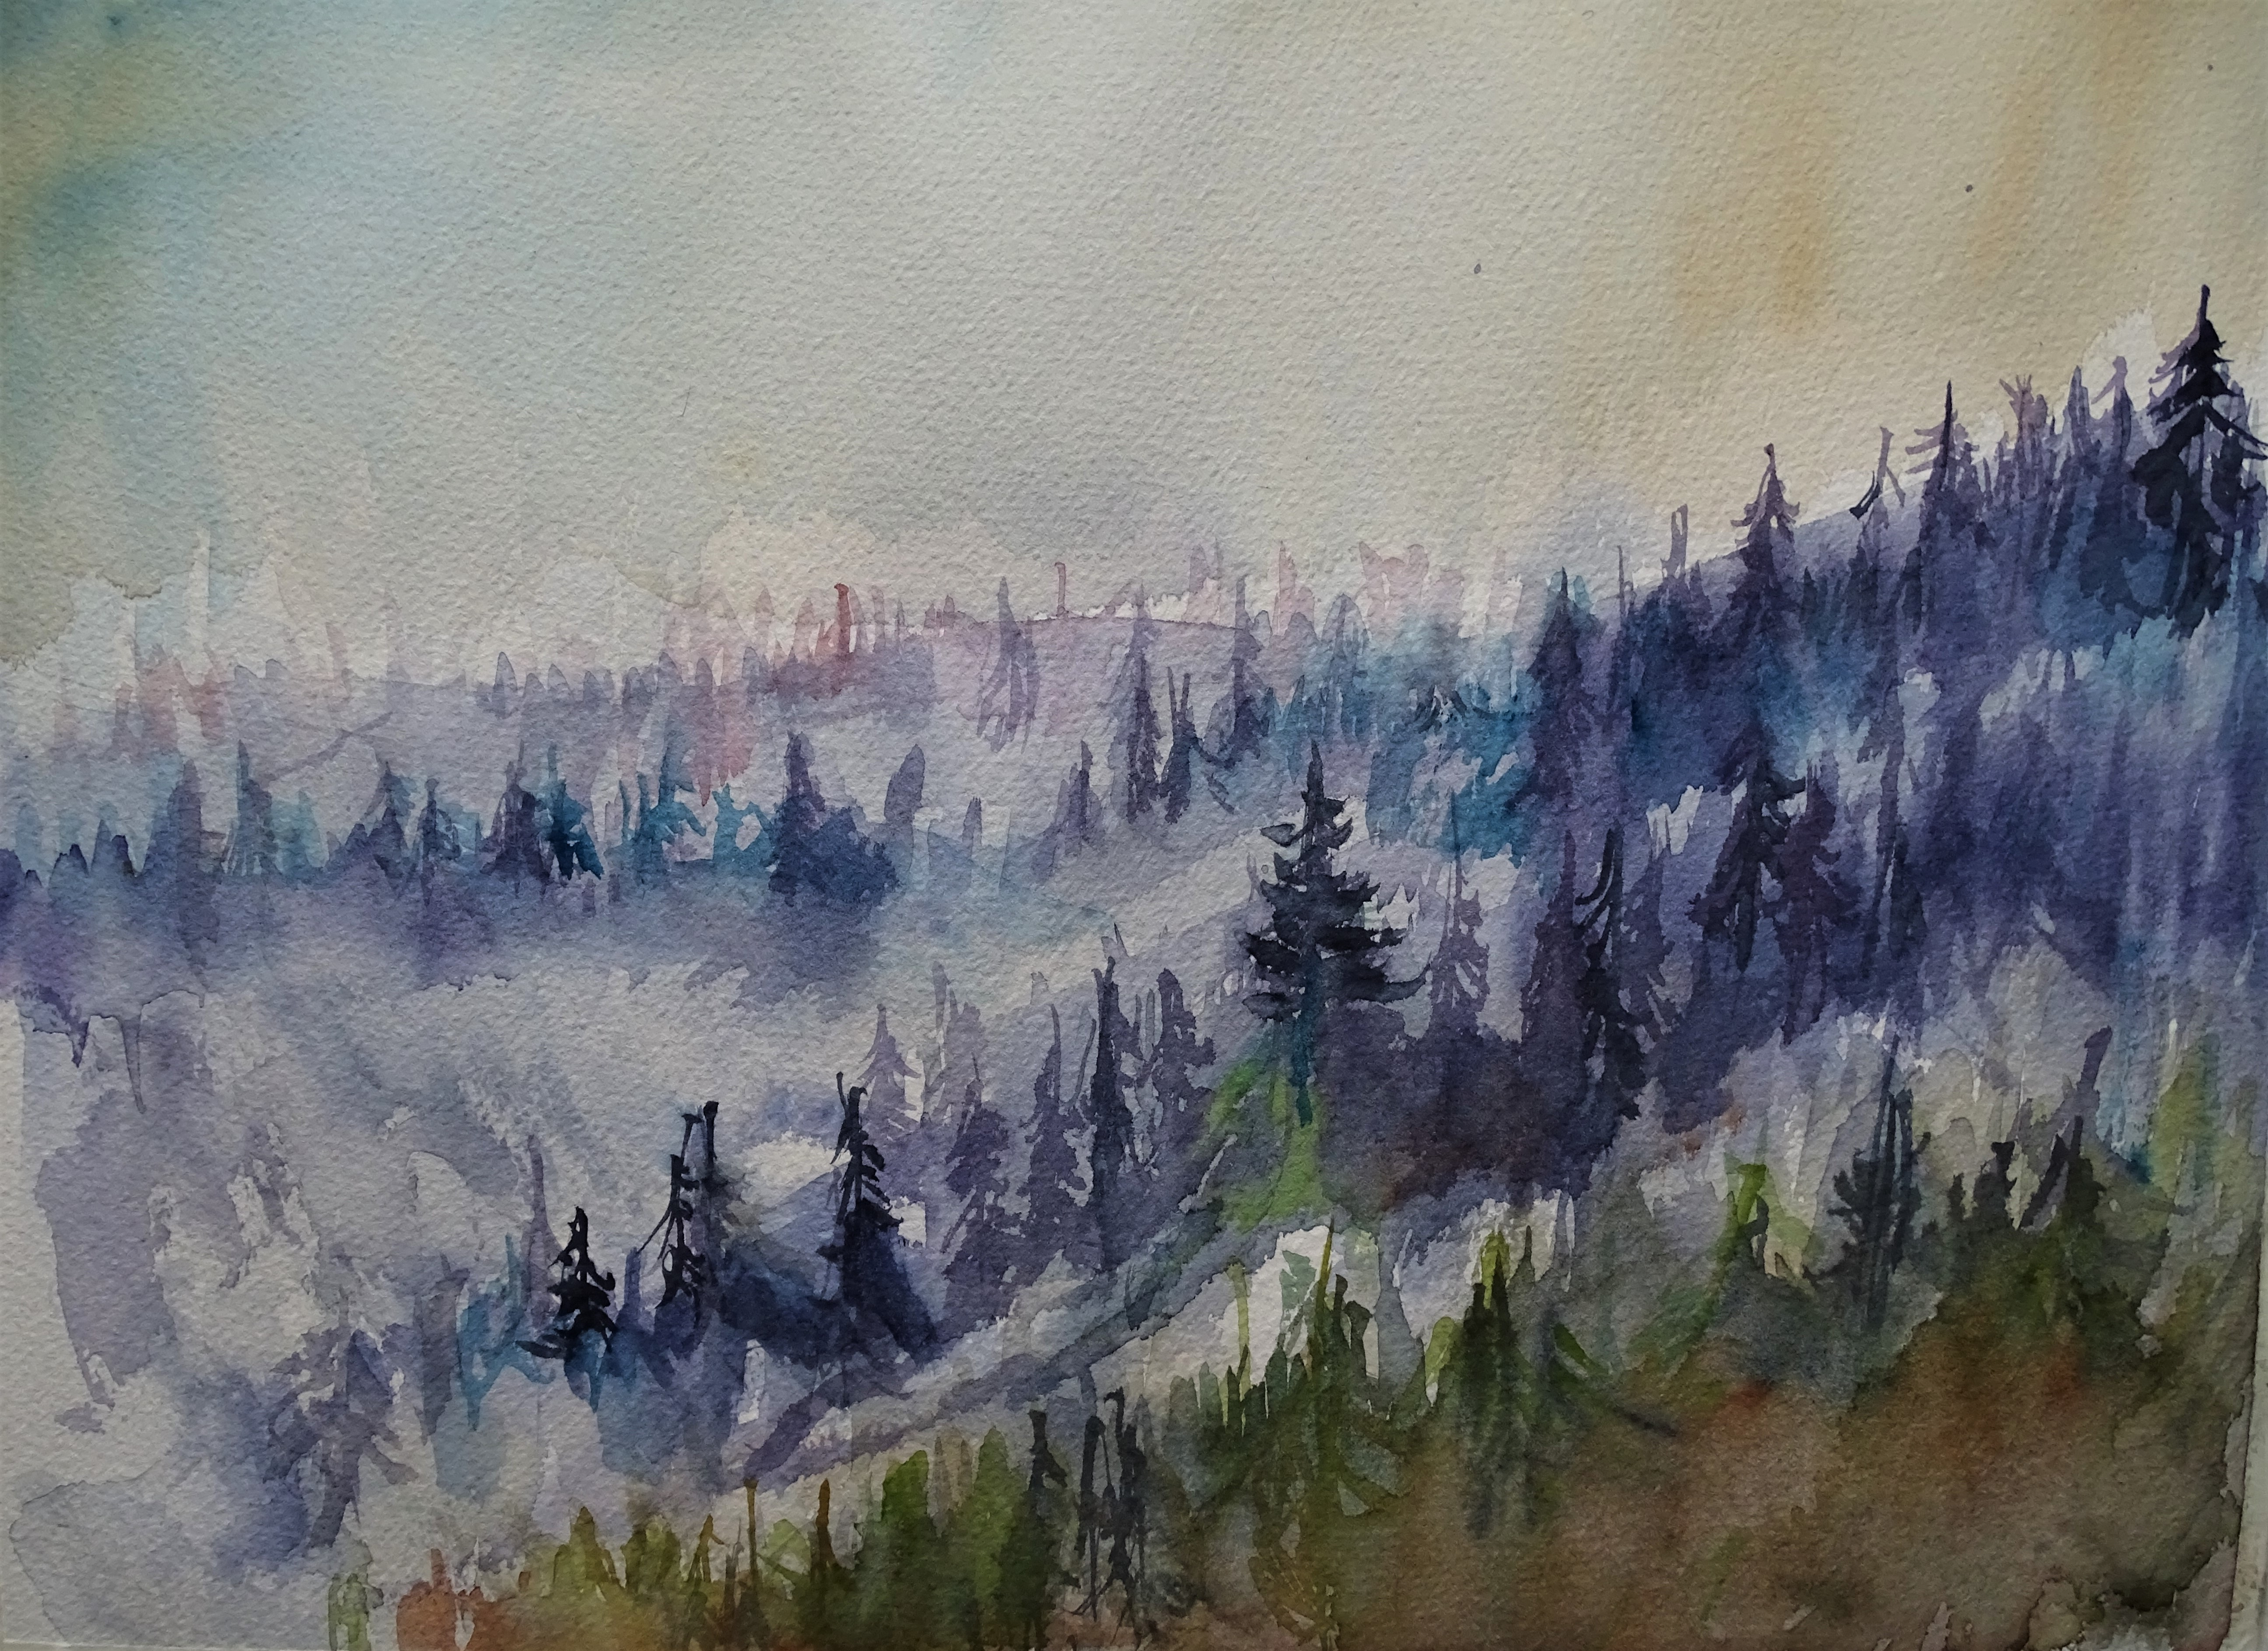 Bayerischer-Wald-Nebel-Aquarelle-Nadia-Baumgart